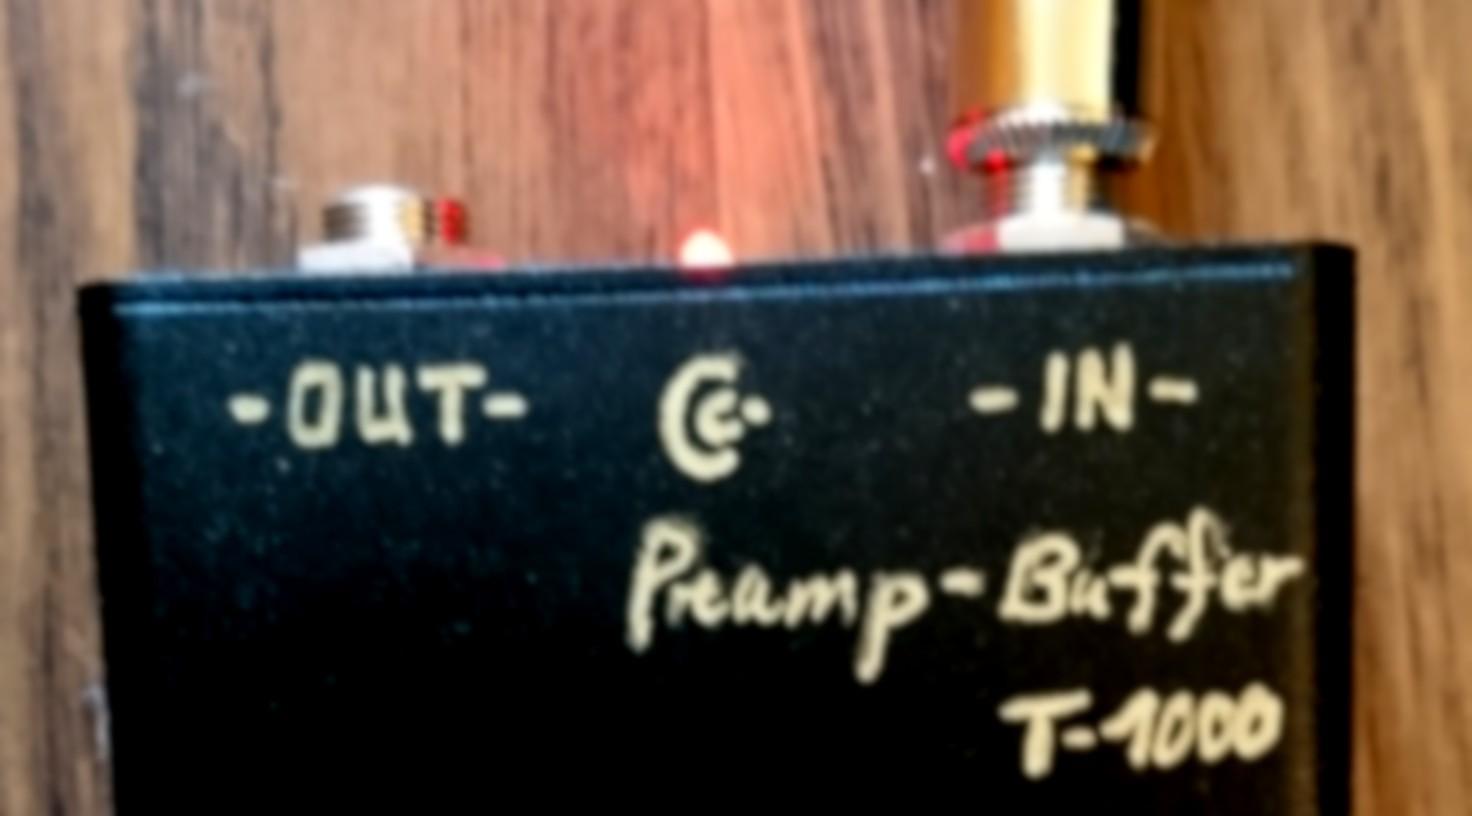 Premp - Buffer T-1000